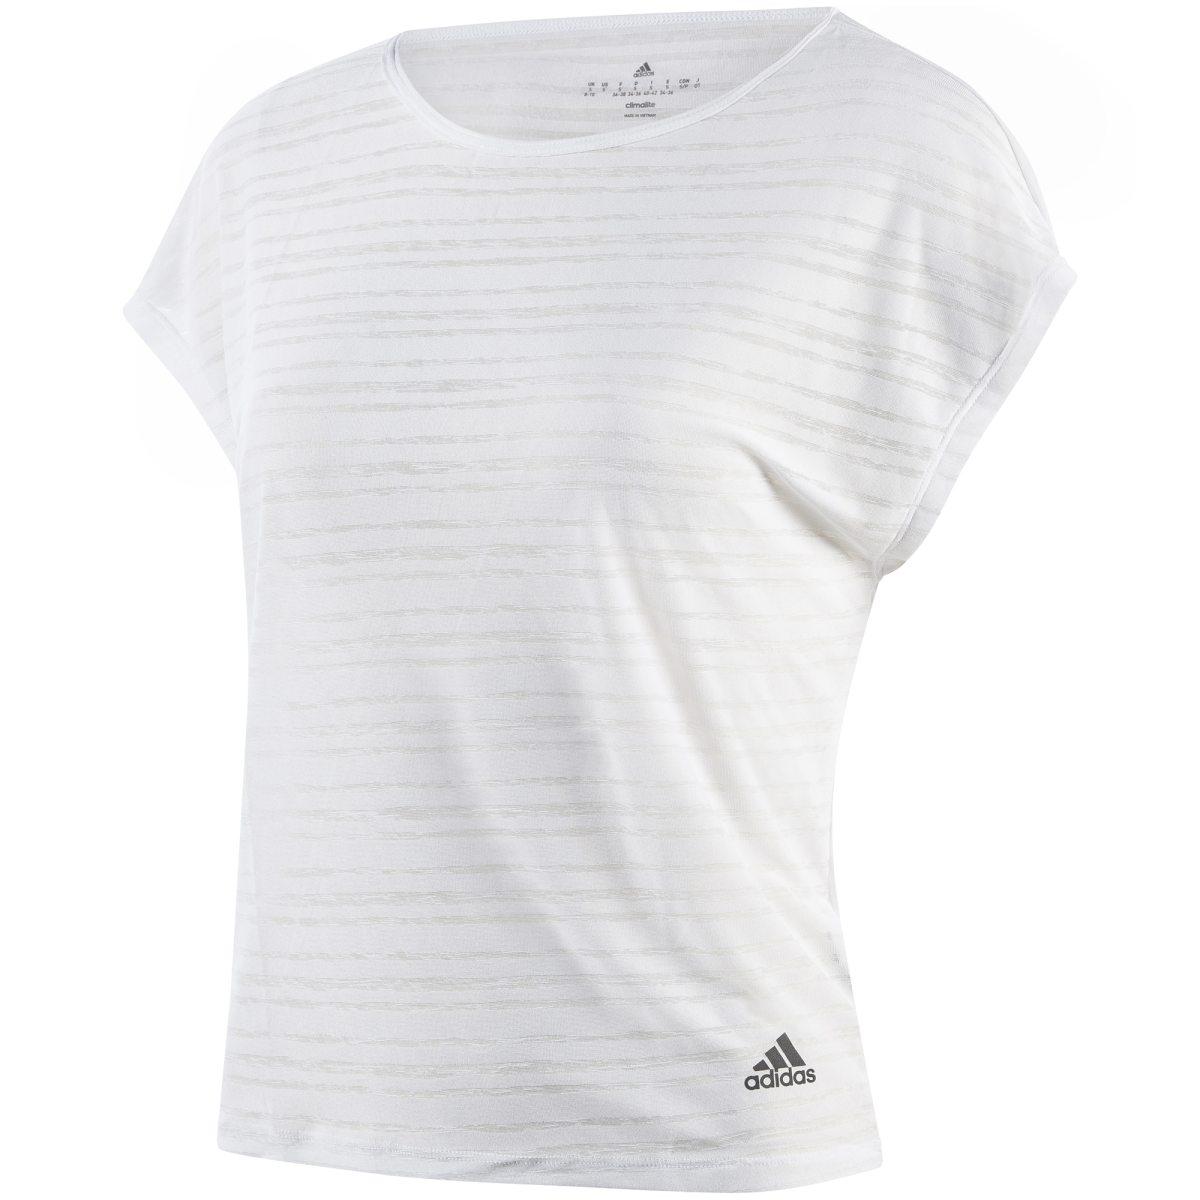 adidas skor dam nelly, Adidas SvFF shorts Blå Barn,adidas